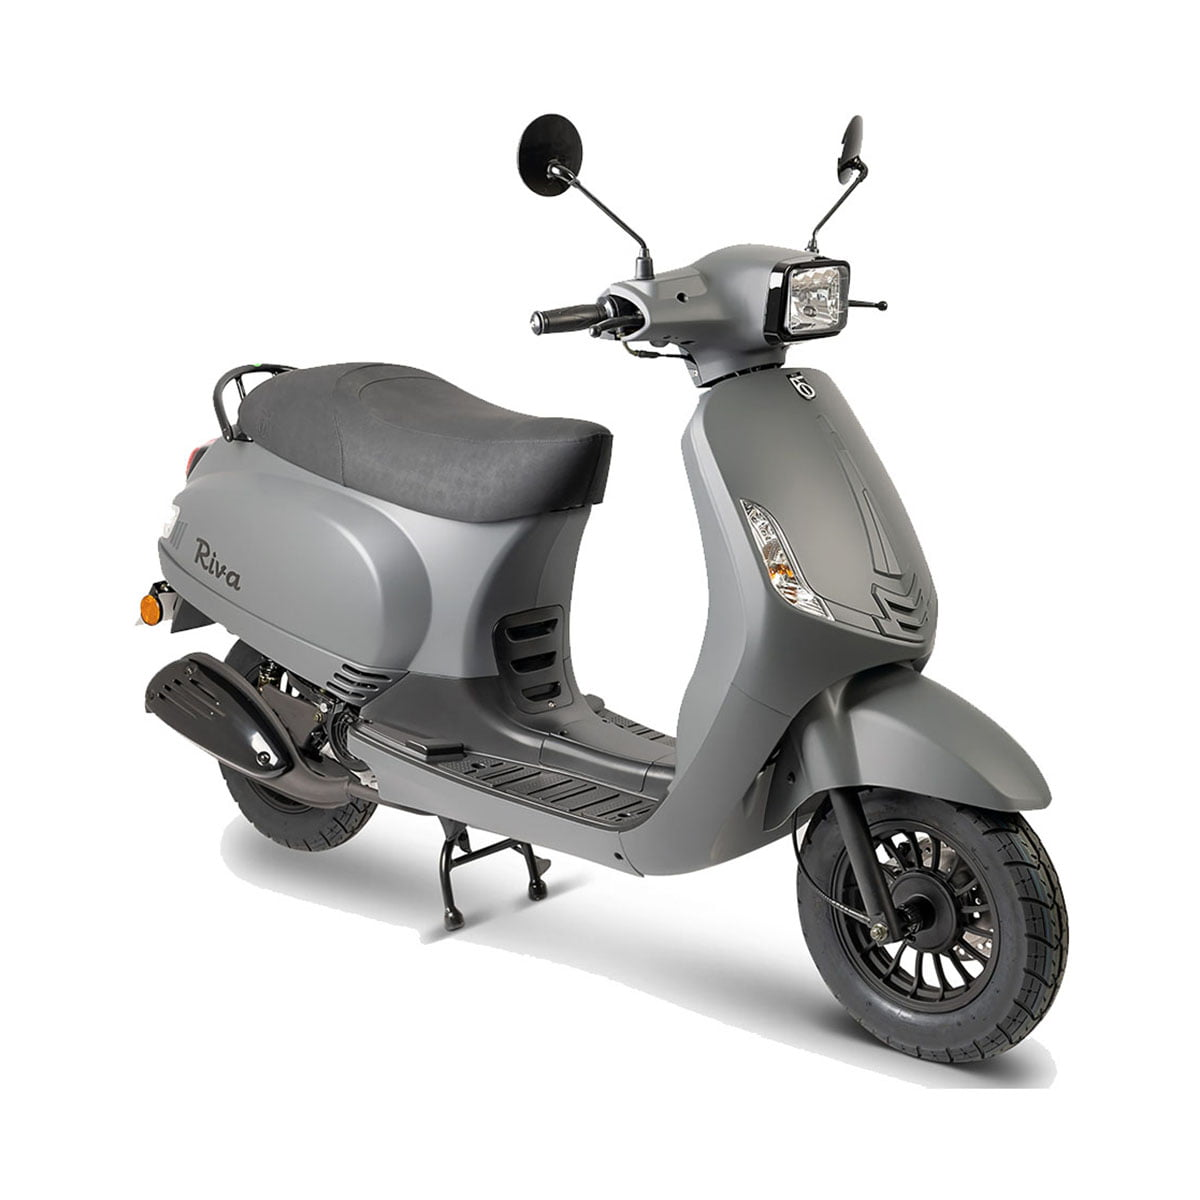 BTC Riva i Sport Grijs Metalic AAH Scooters